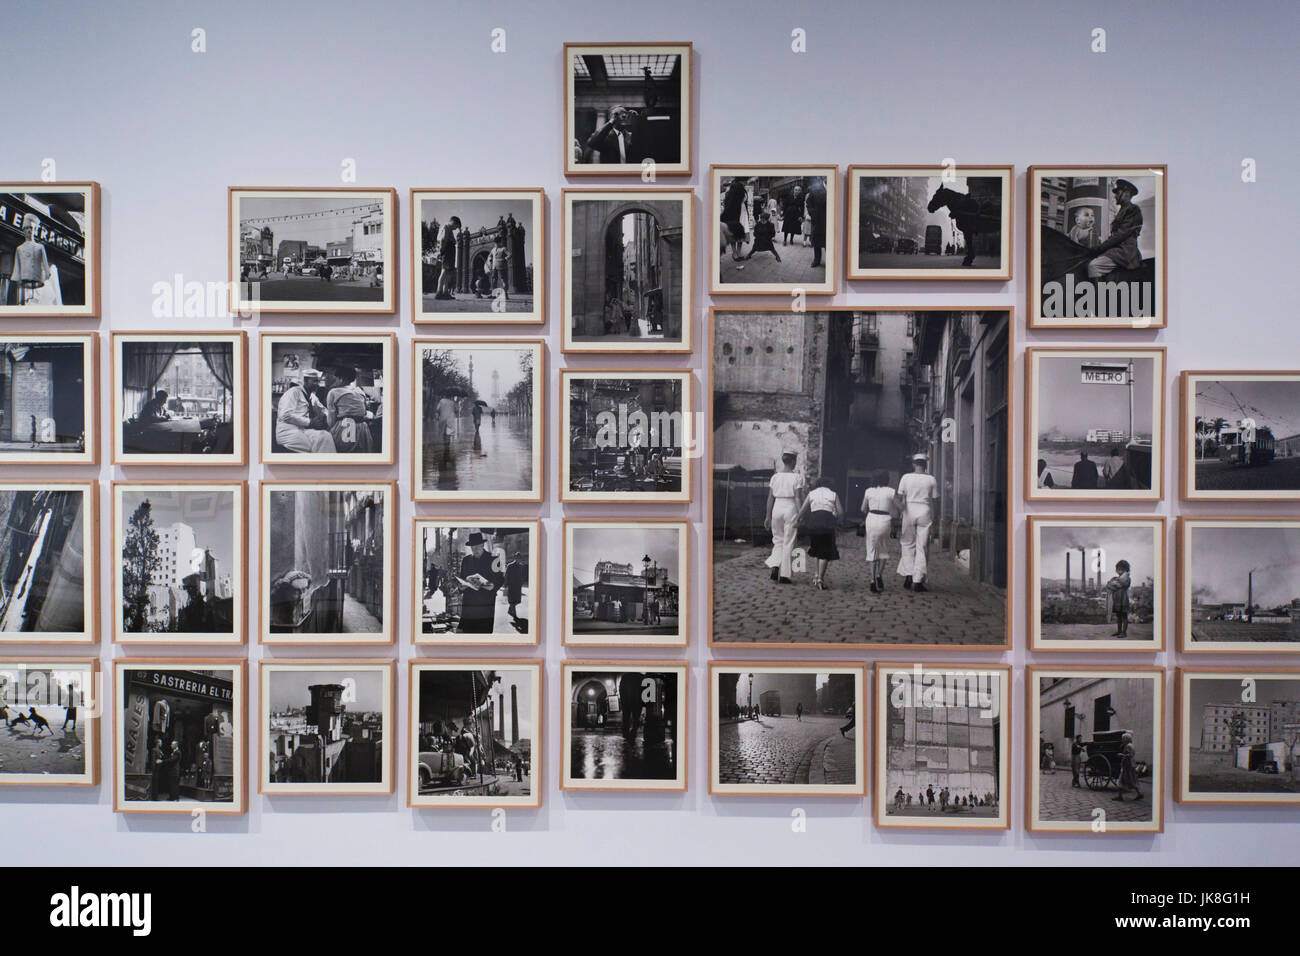 Spain, Madrid, Atocha Area, Centro de Arte Reina Sofia museum, exhibit of 1950s-era photographs by Catalan photographer - Stock Image